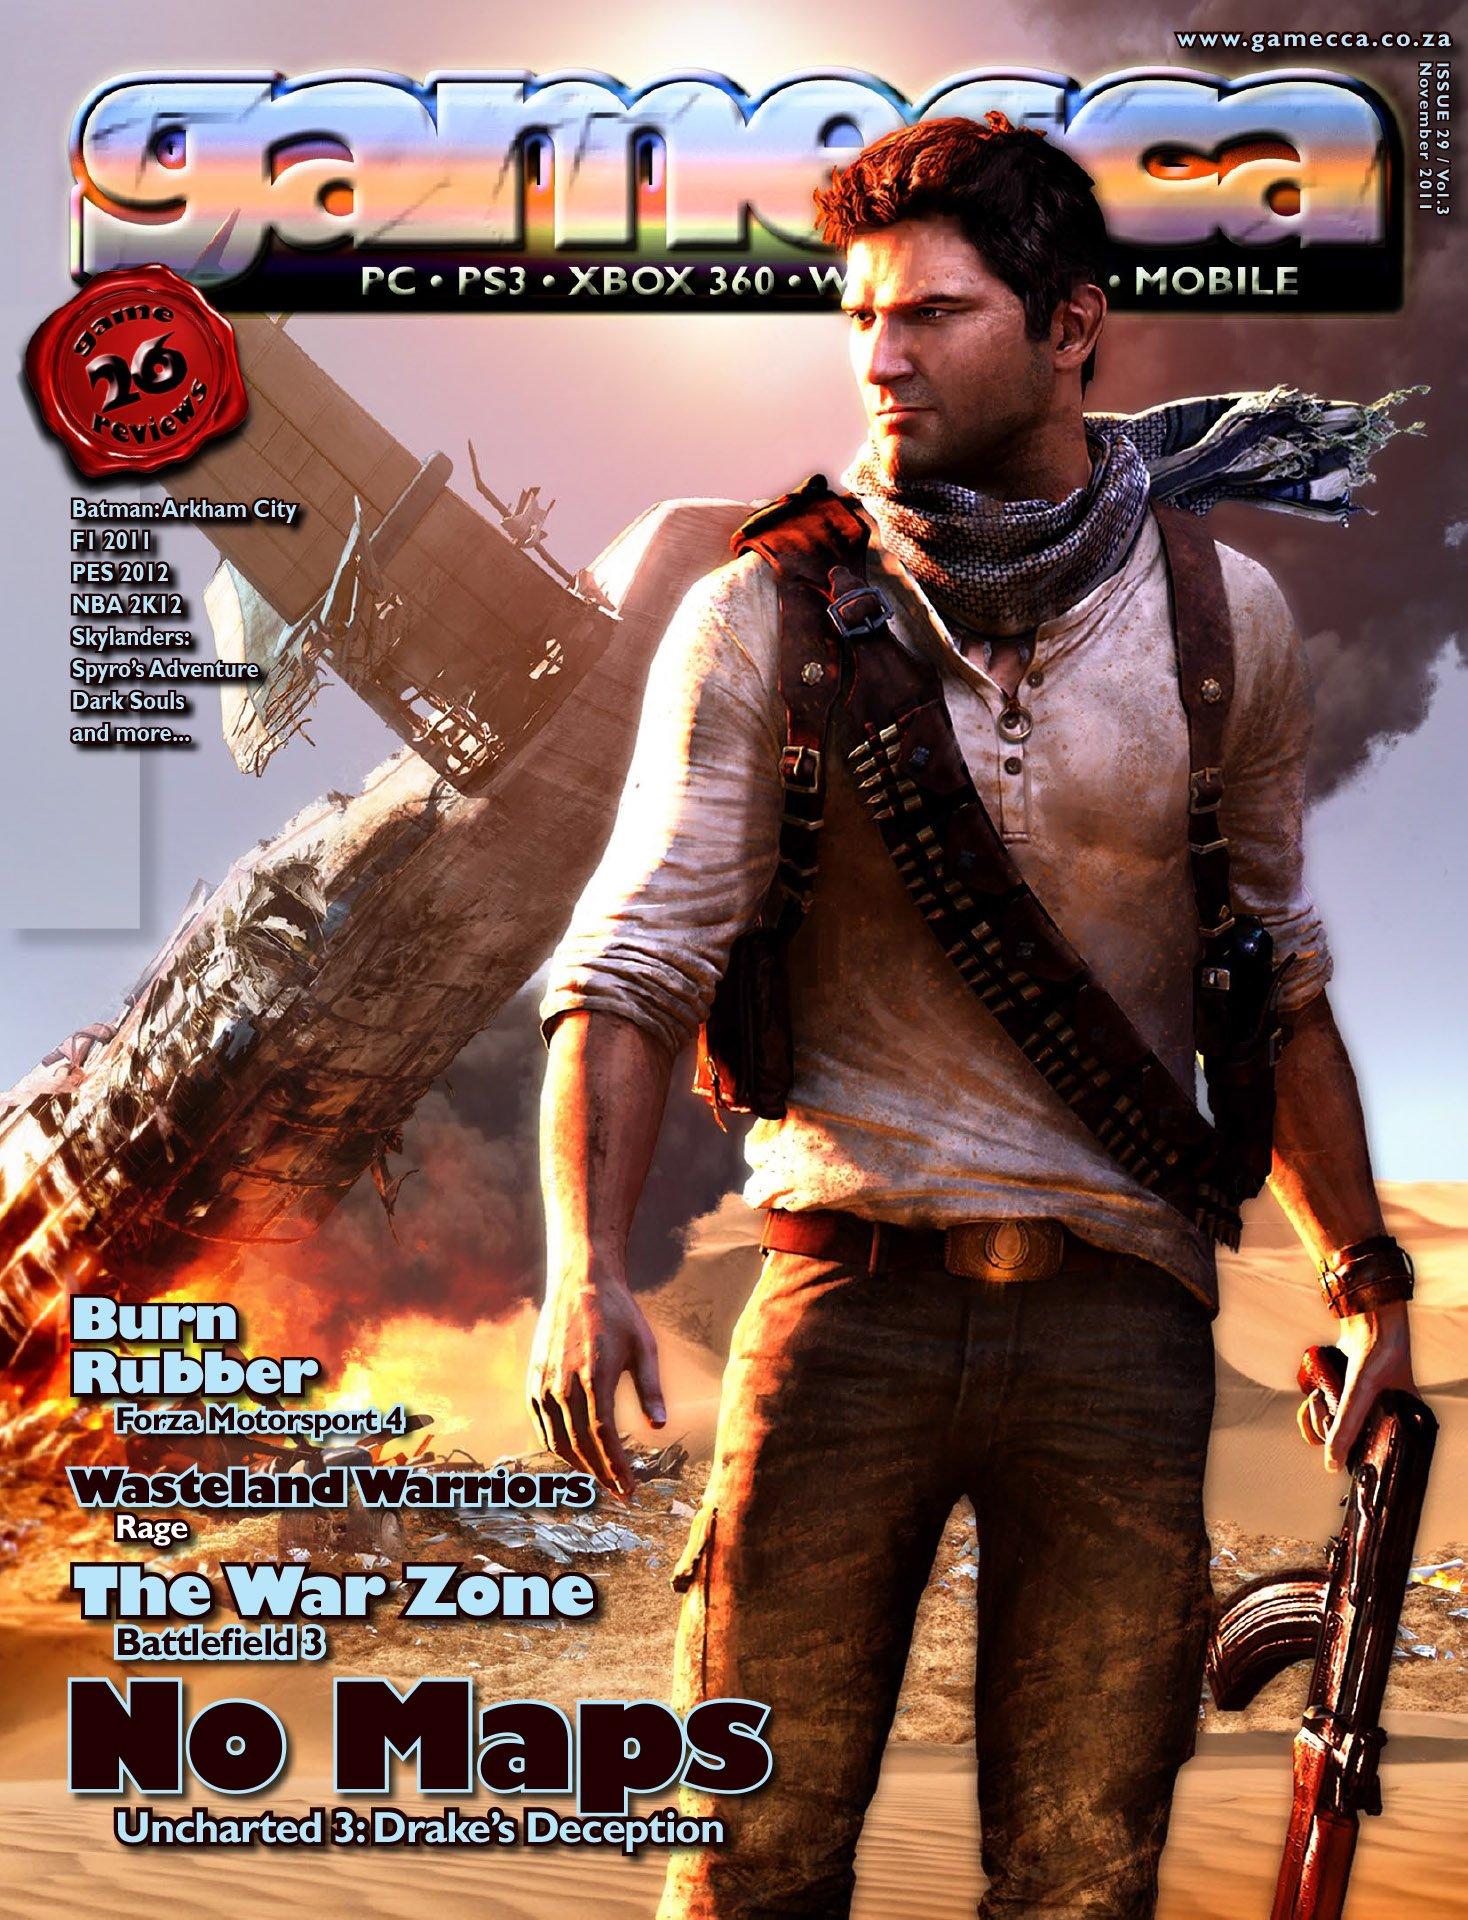 Gamecca 029 (November 2011)